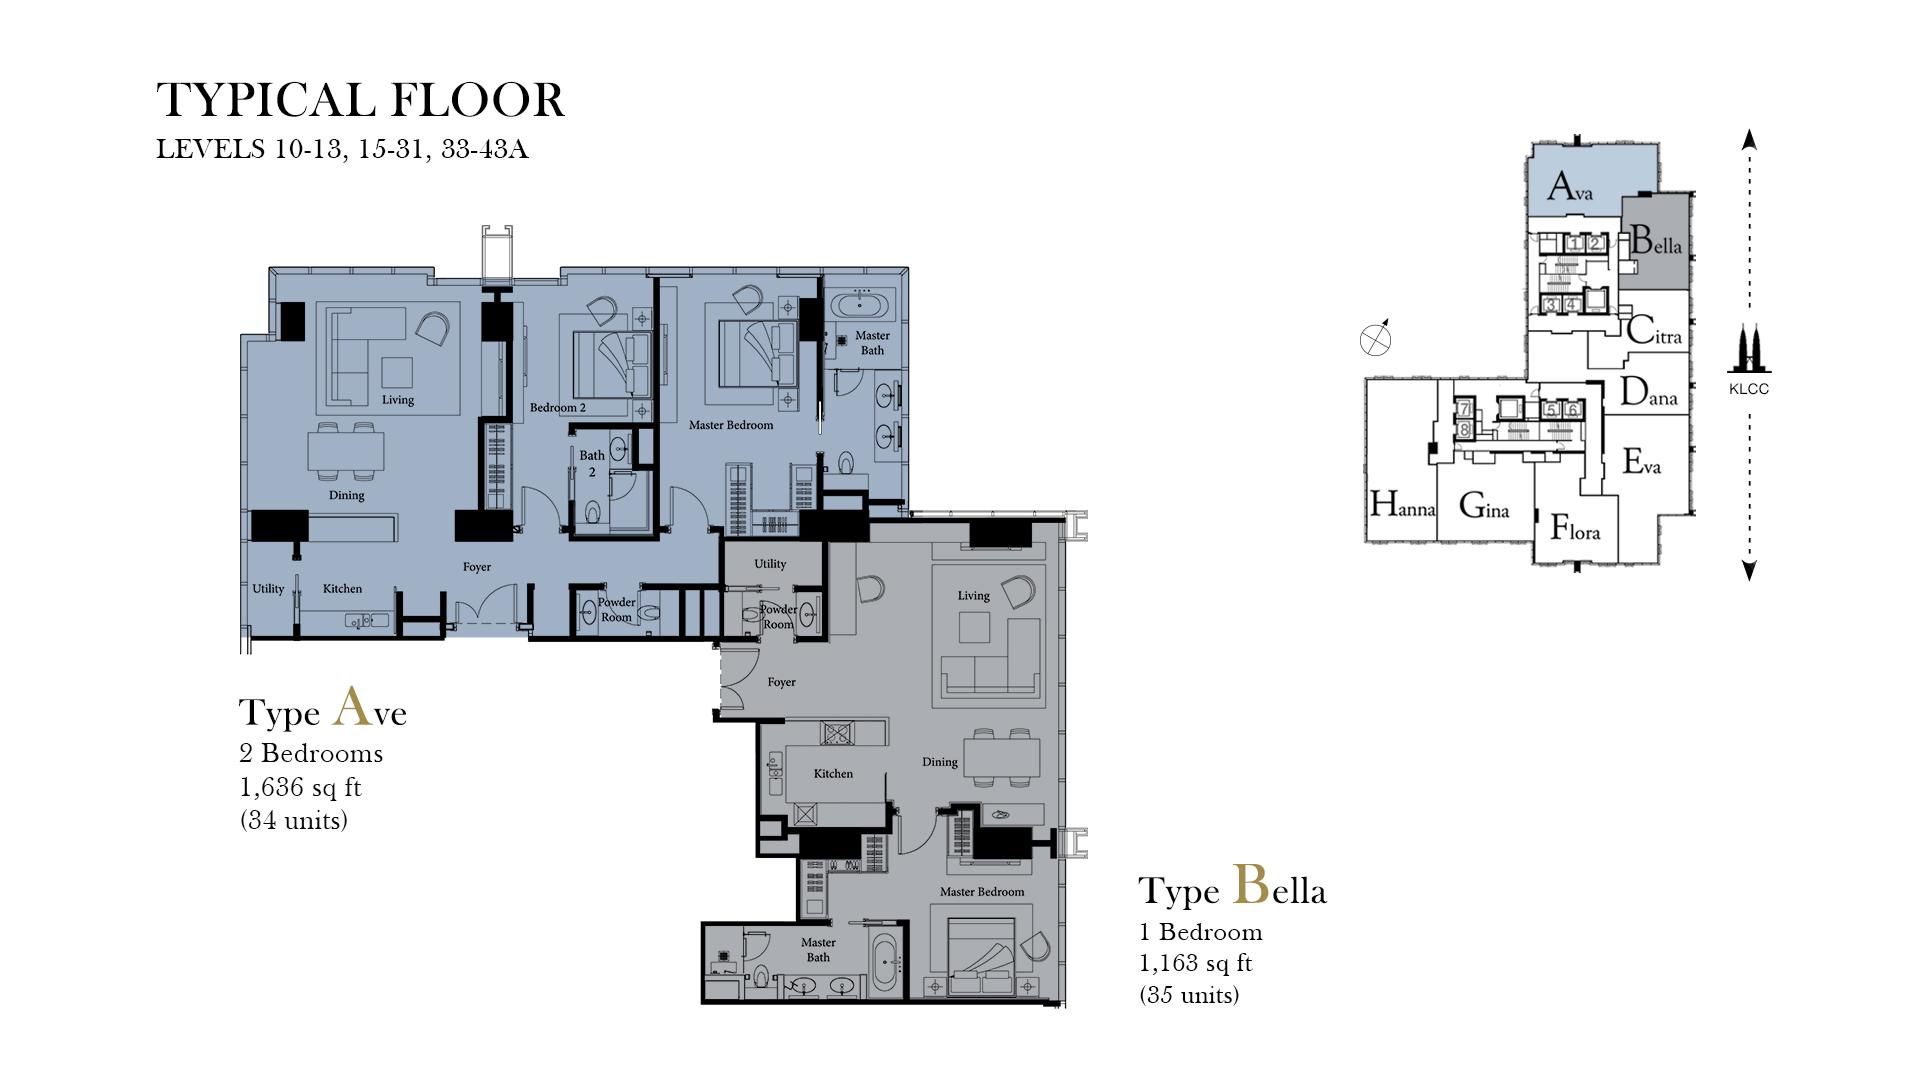 Ritz Carlton Residences Floor Plans Klcc Condominium New Launch For Sale